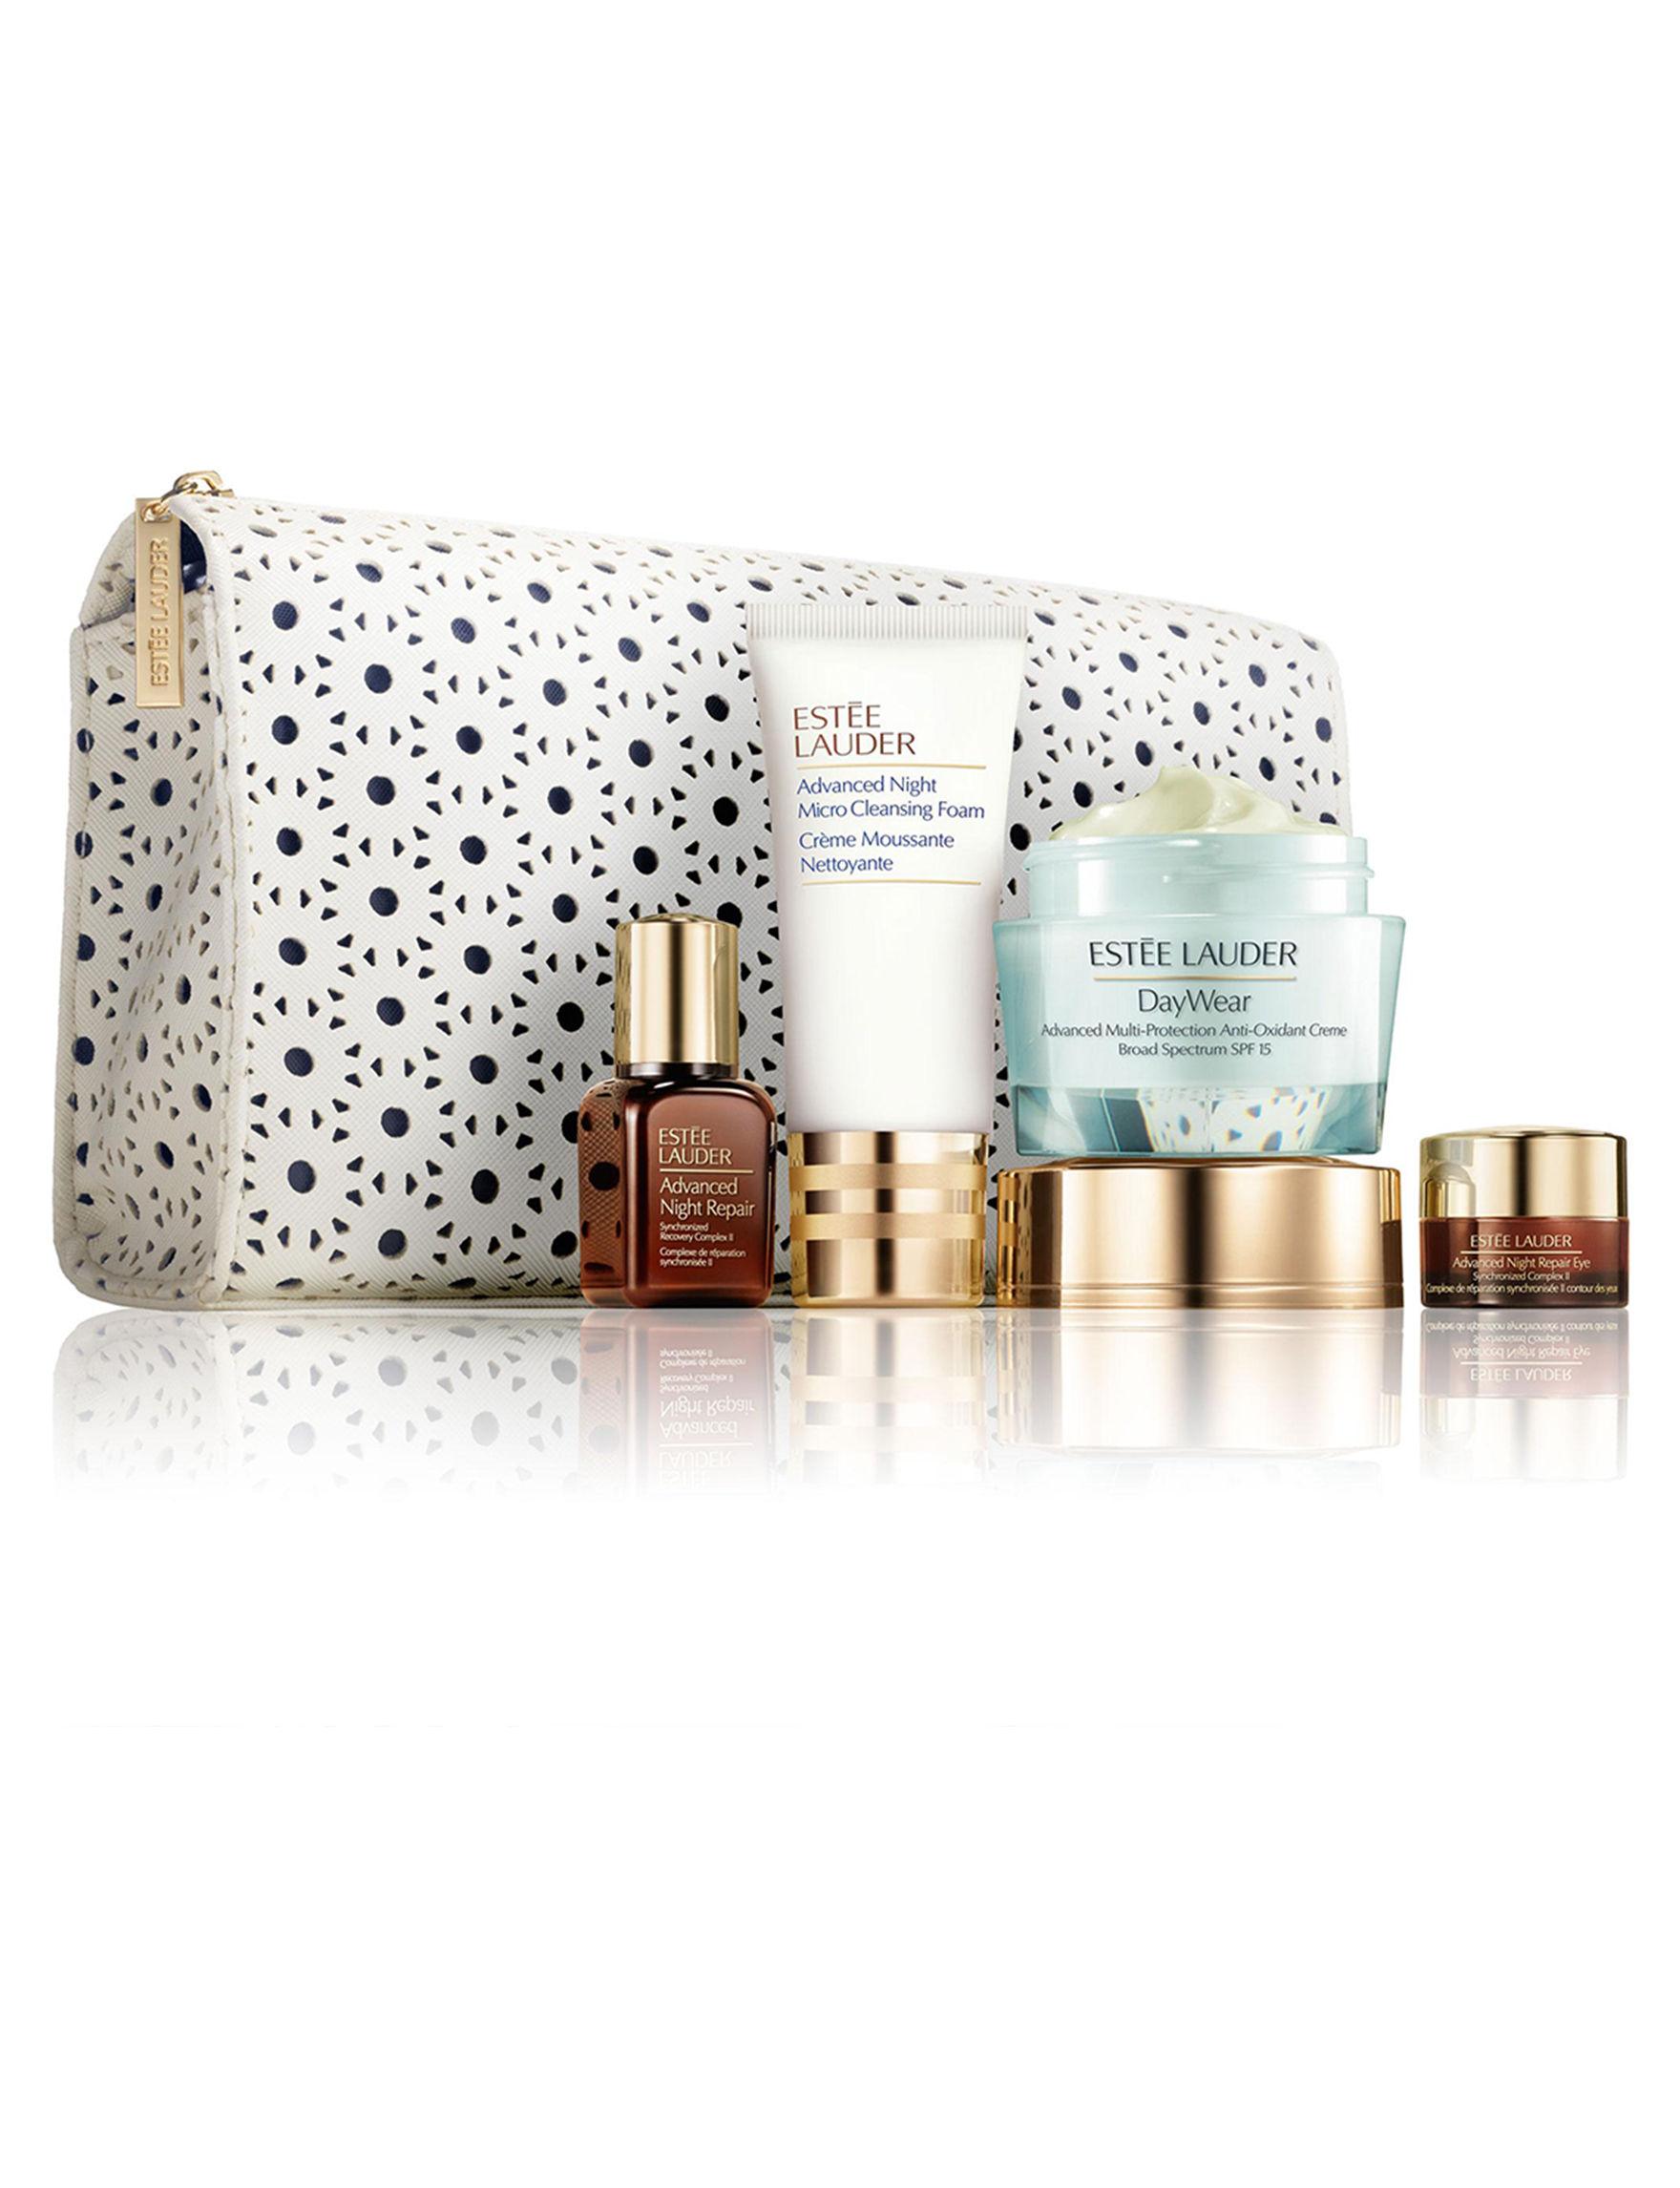 Estee Lauder  Skin Care Kits & Sets